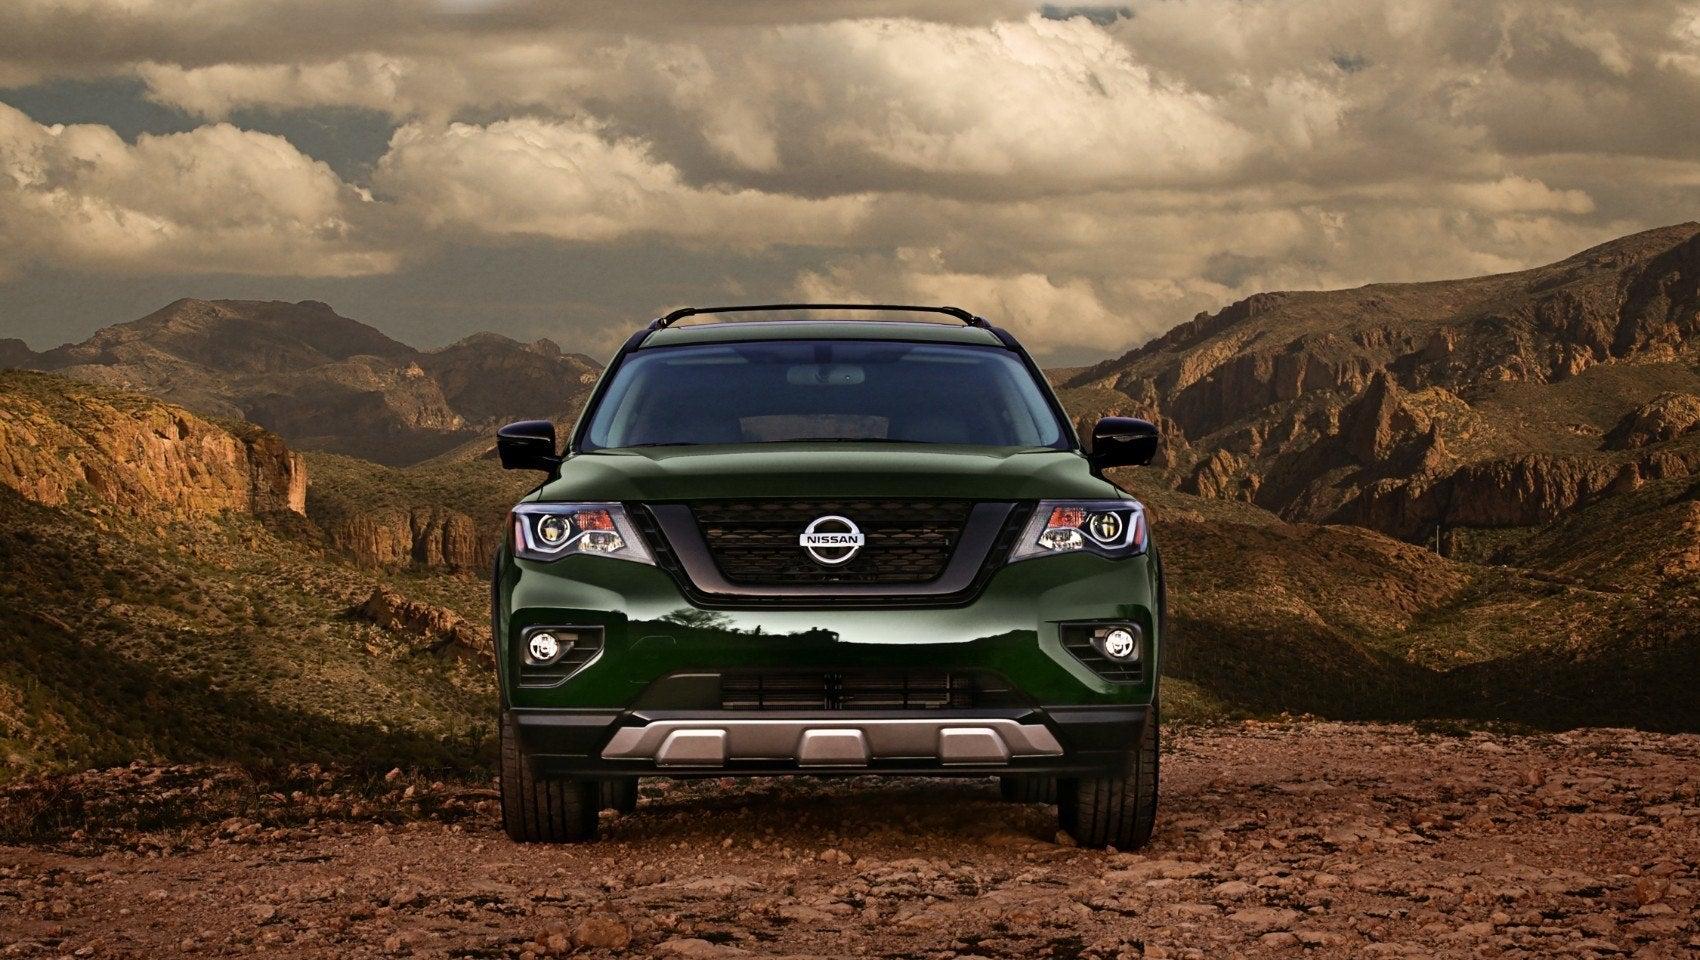 Pathfinder Rock Creek Edition: Nissan Stacks On The Goodies